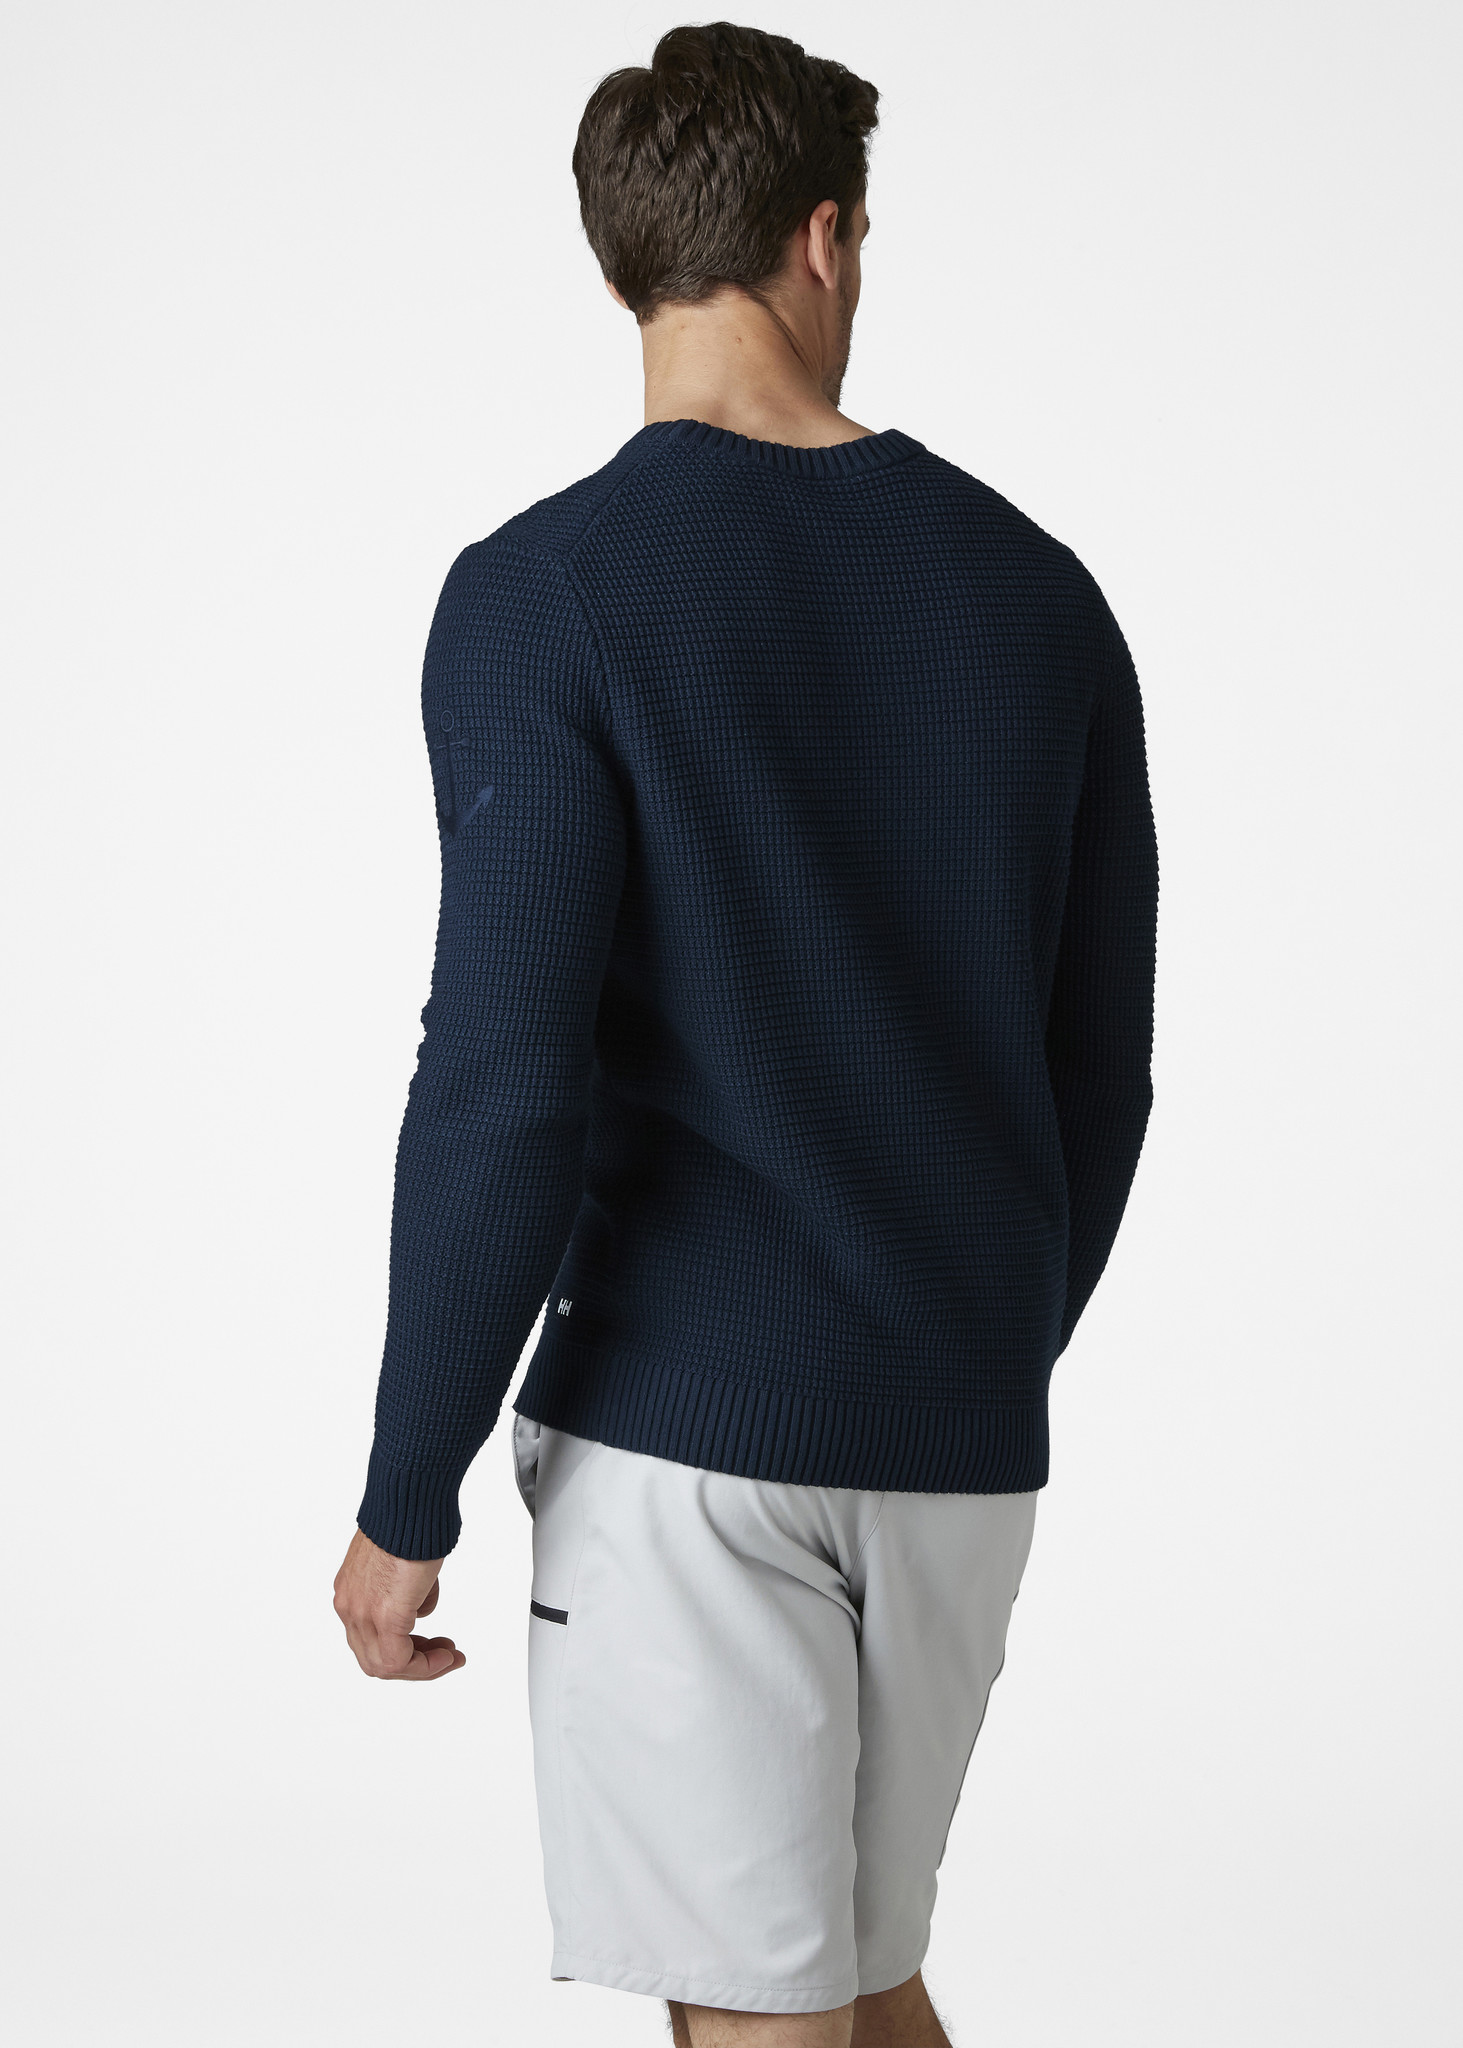 Helly Hansen Fjord Sweater - Navy